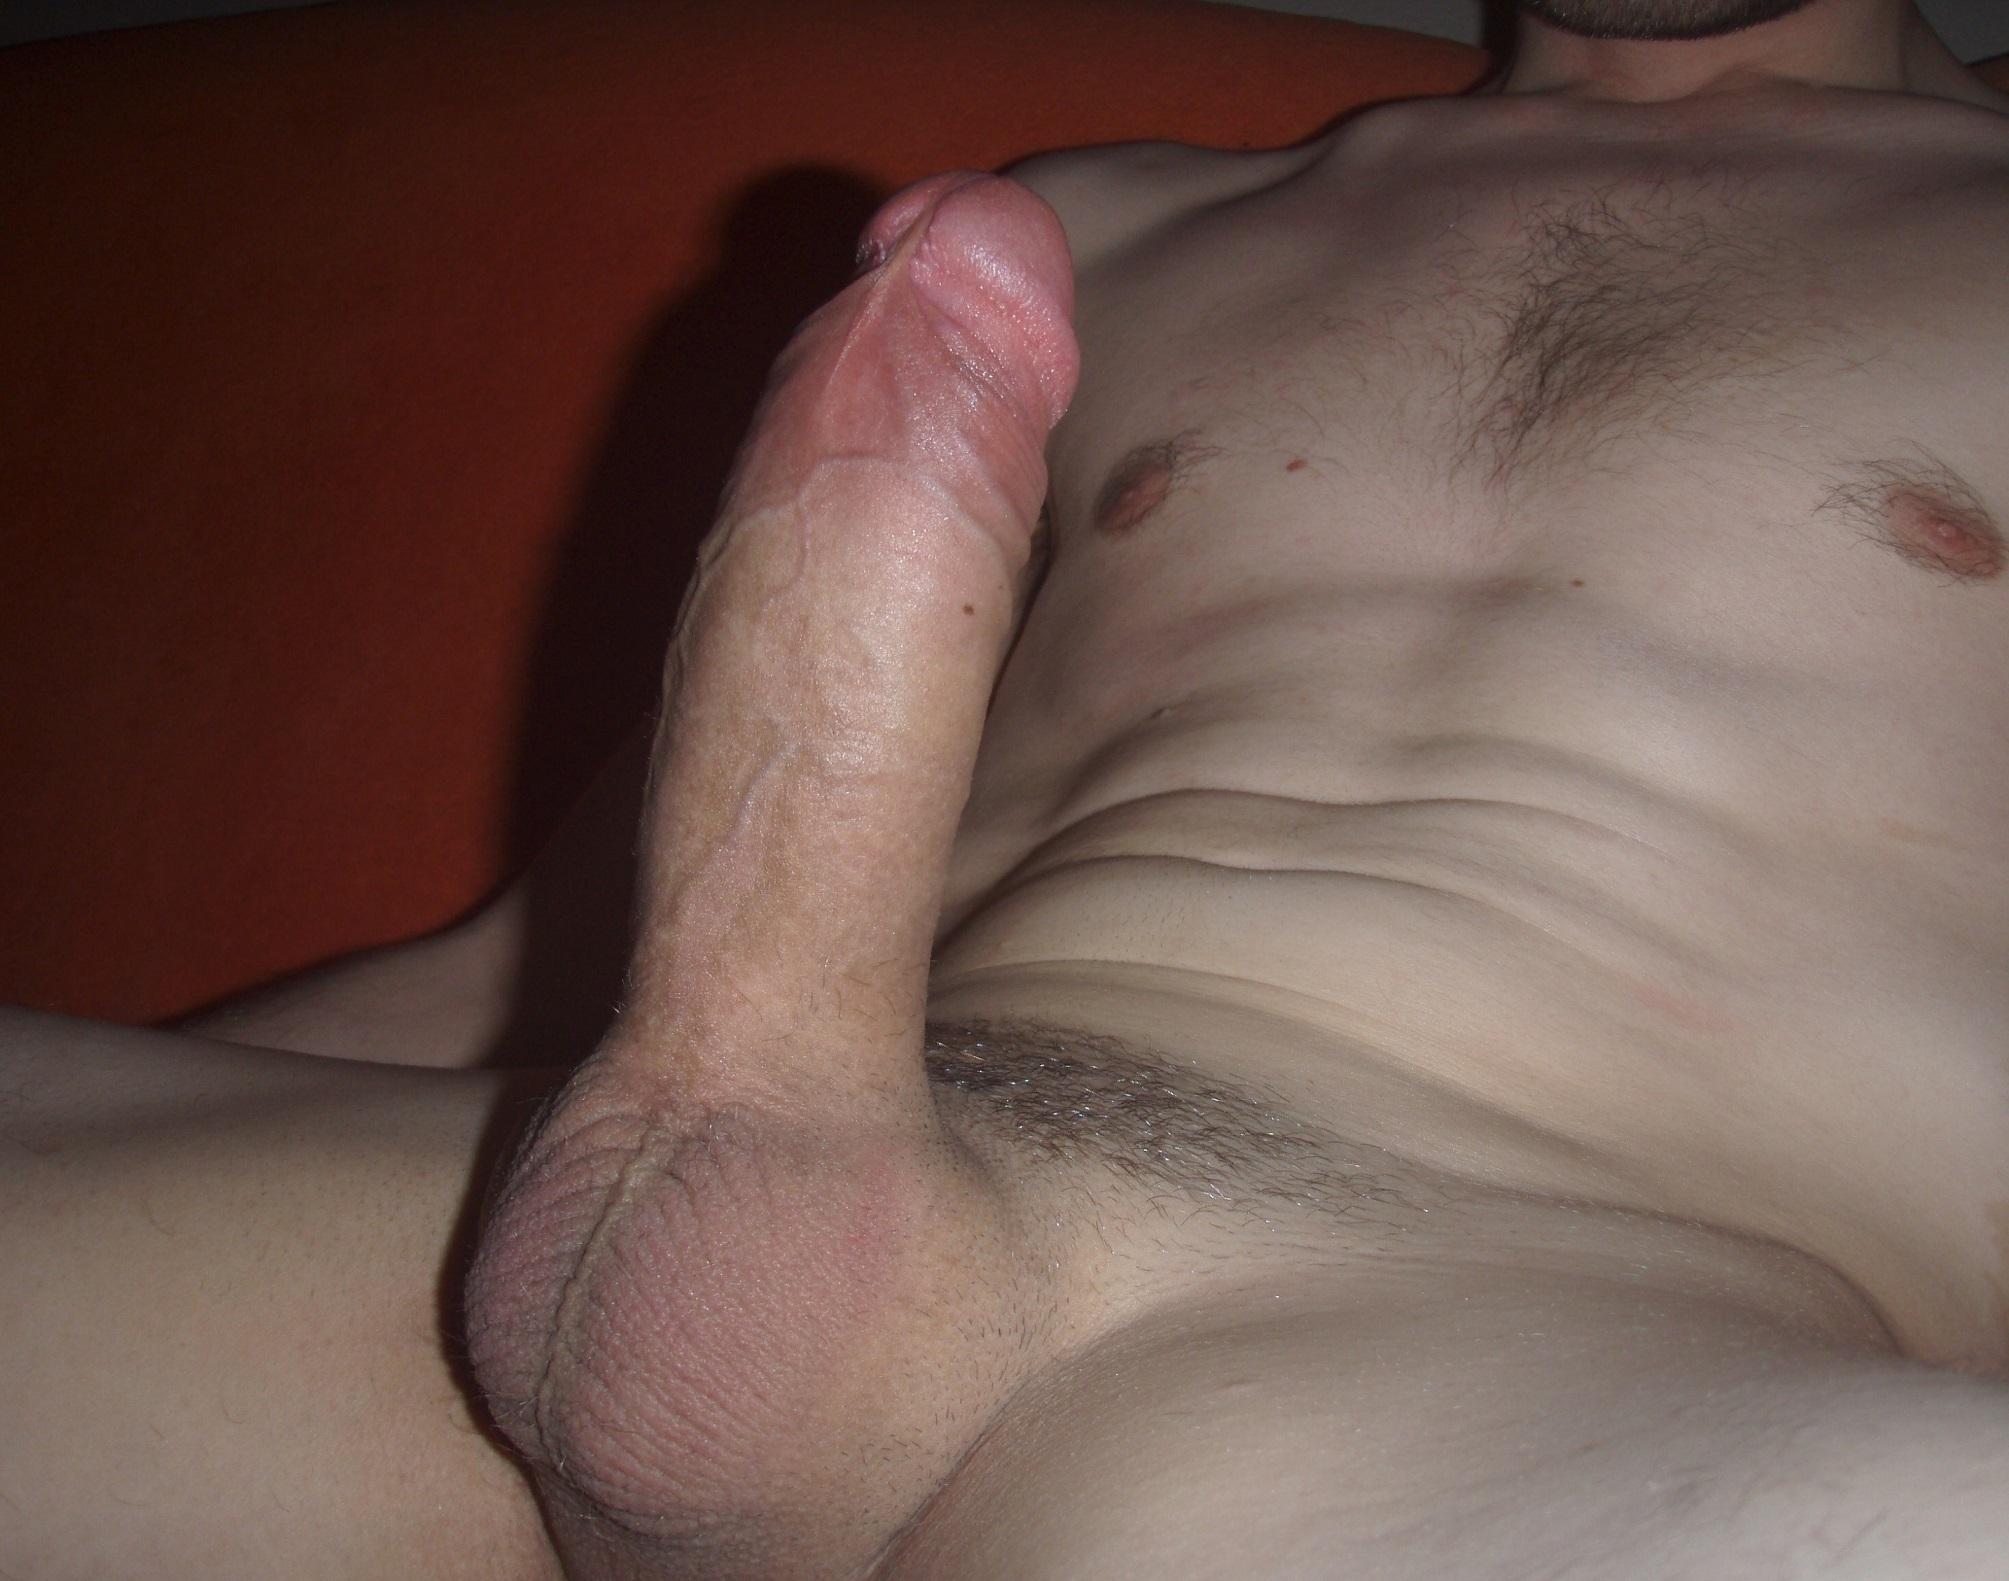 a picture of a skeleton body #cockpic #amateur #hardon #hardcock #tightballs #cockpic #thickcock #balls #cock #trimmedcock #stiffcock #erection #schwanz #boner #penis